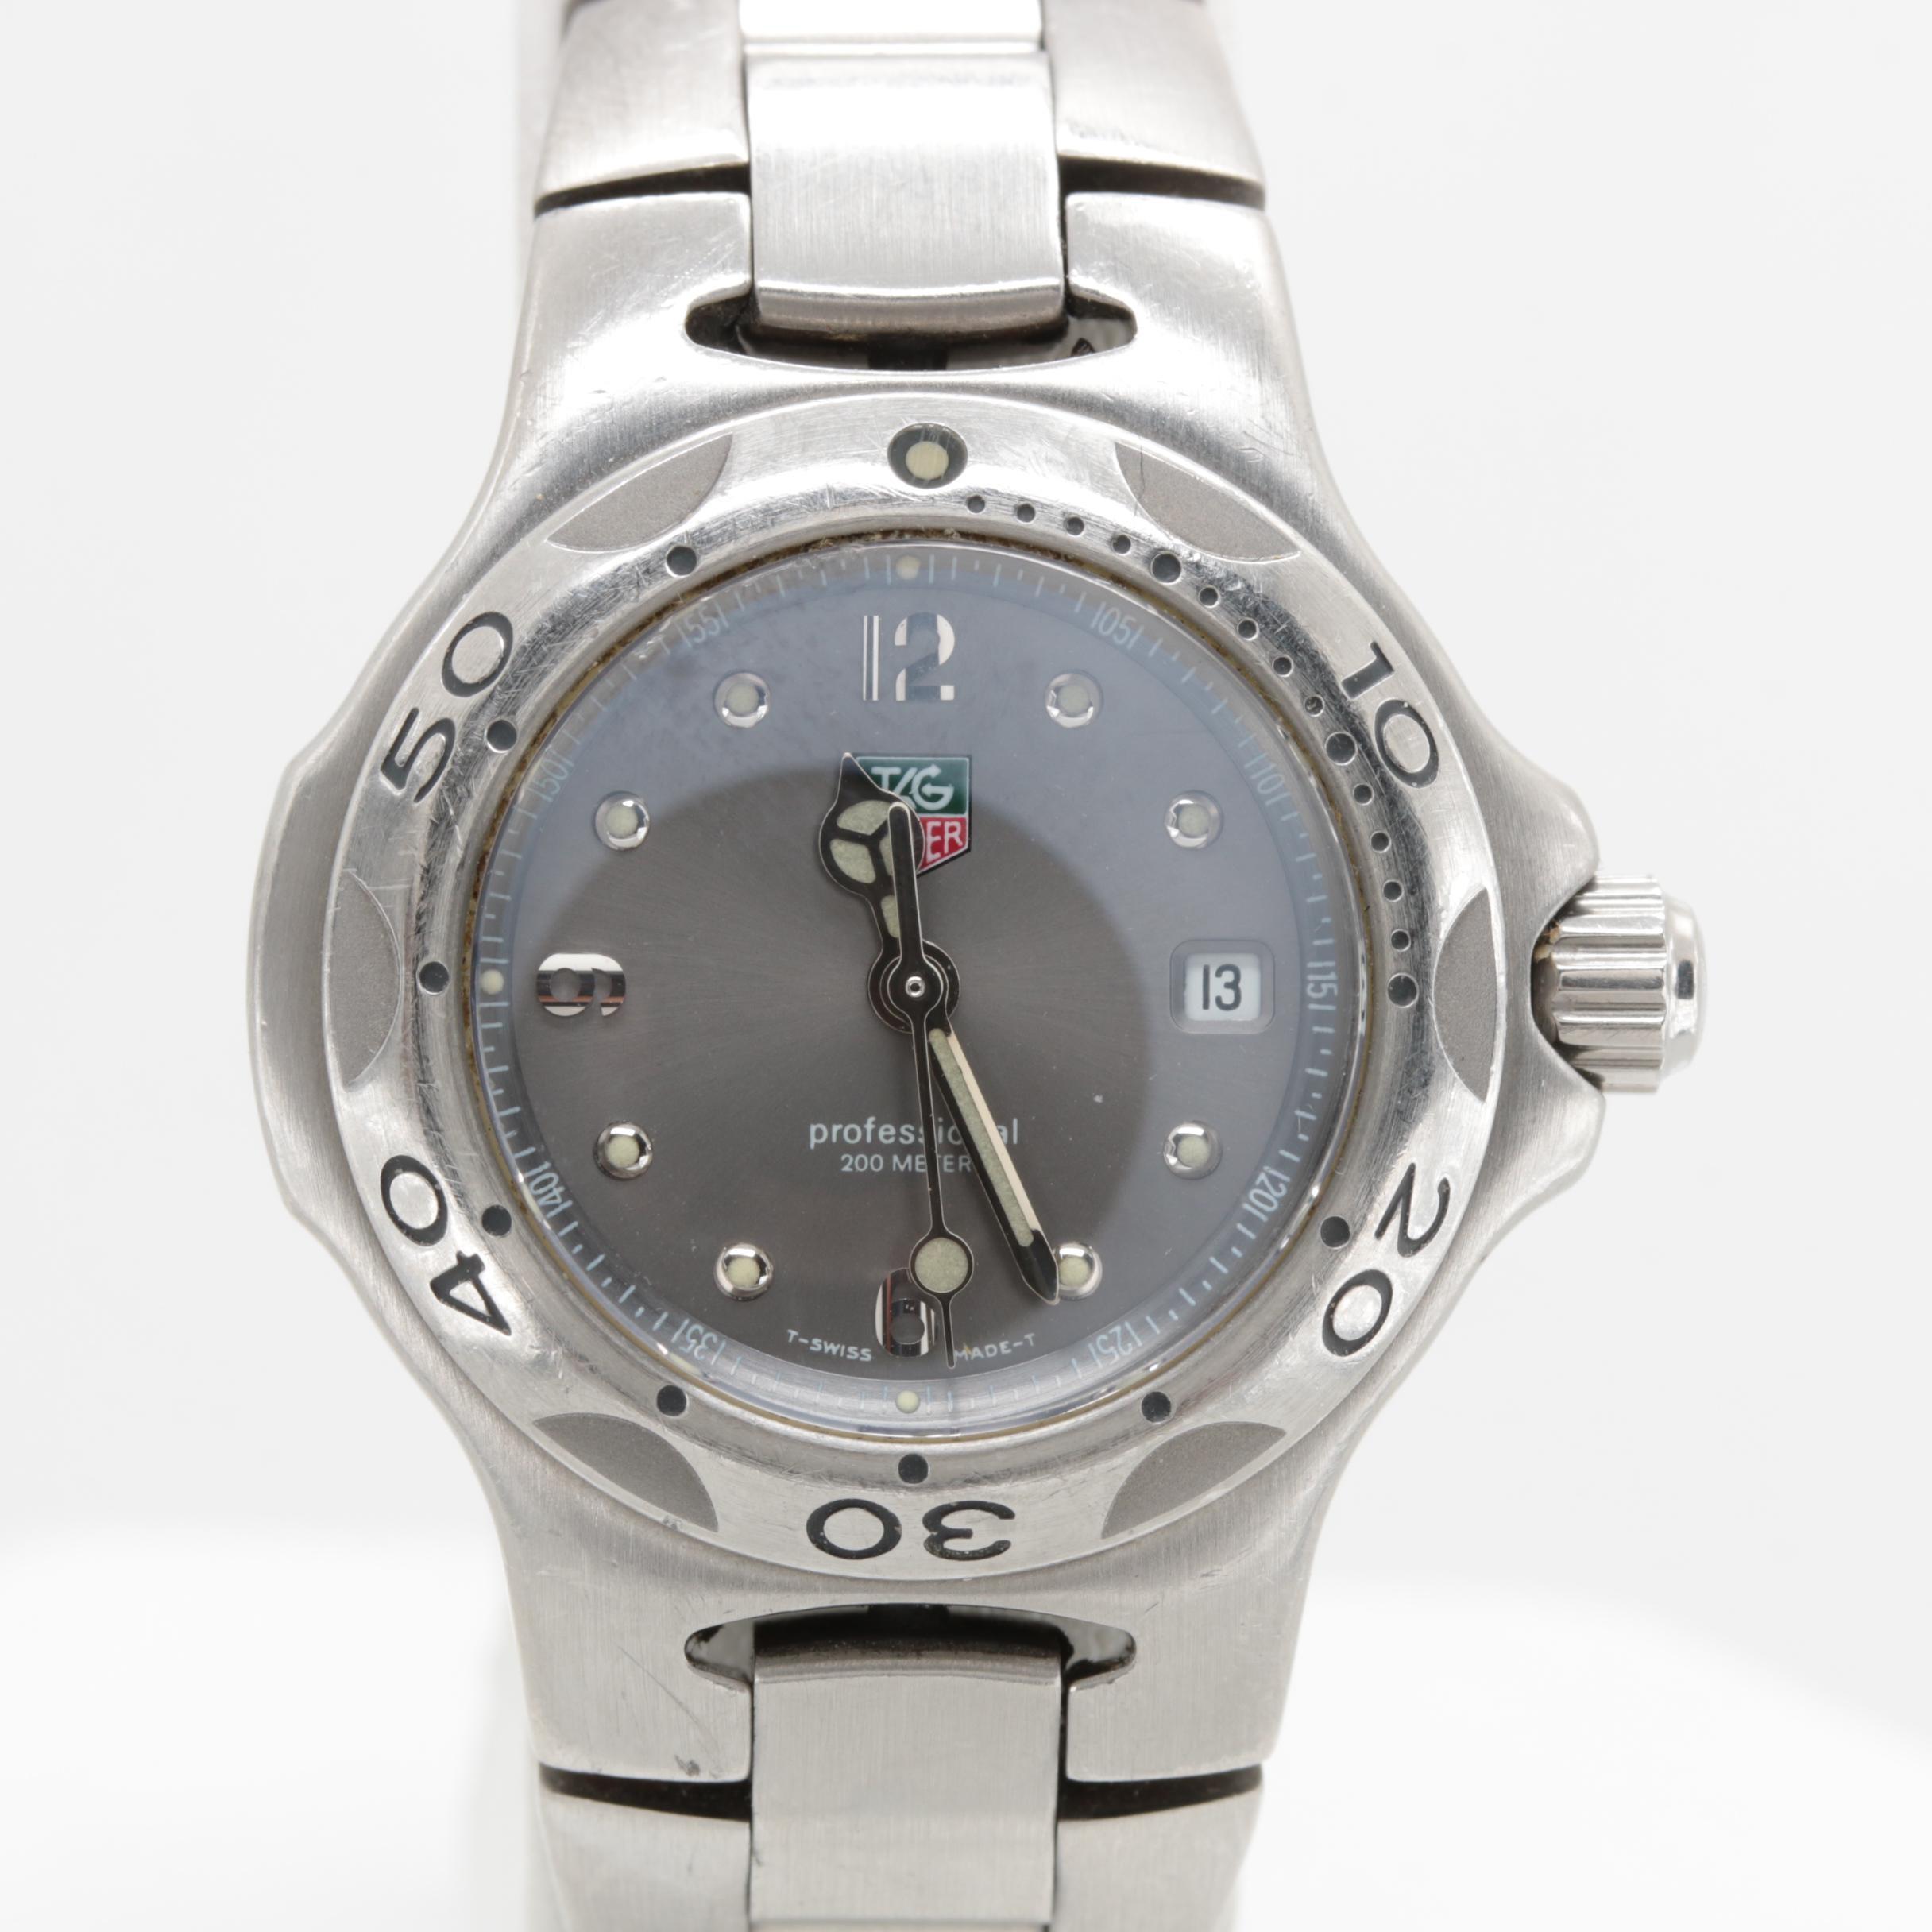 TAG Heuer Kirium 200m Stainless Steel Quartz Wristwatch